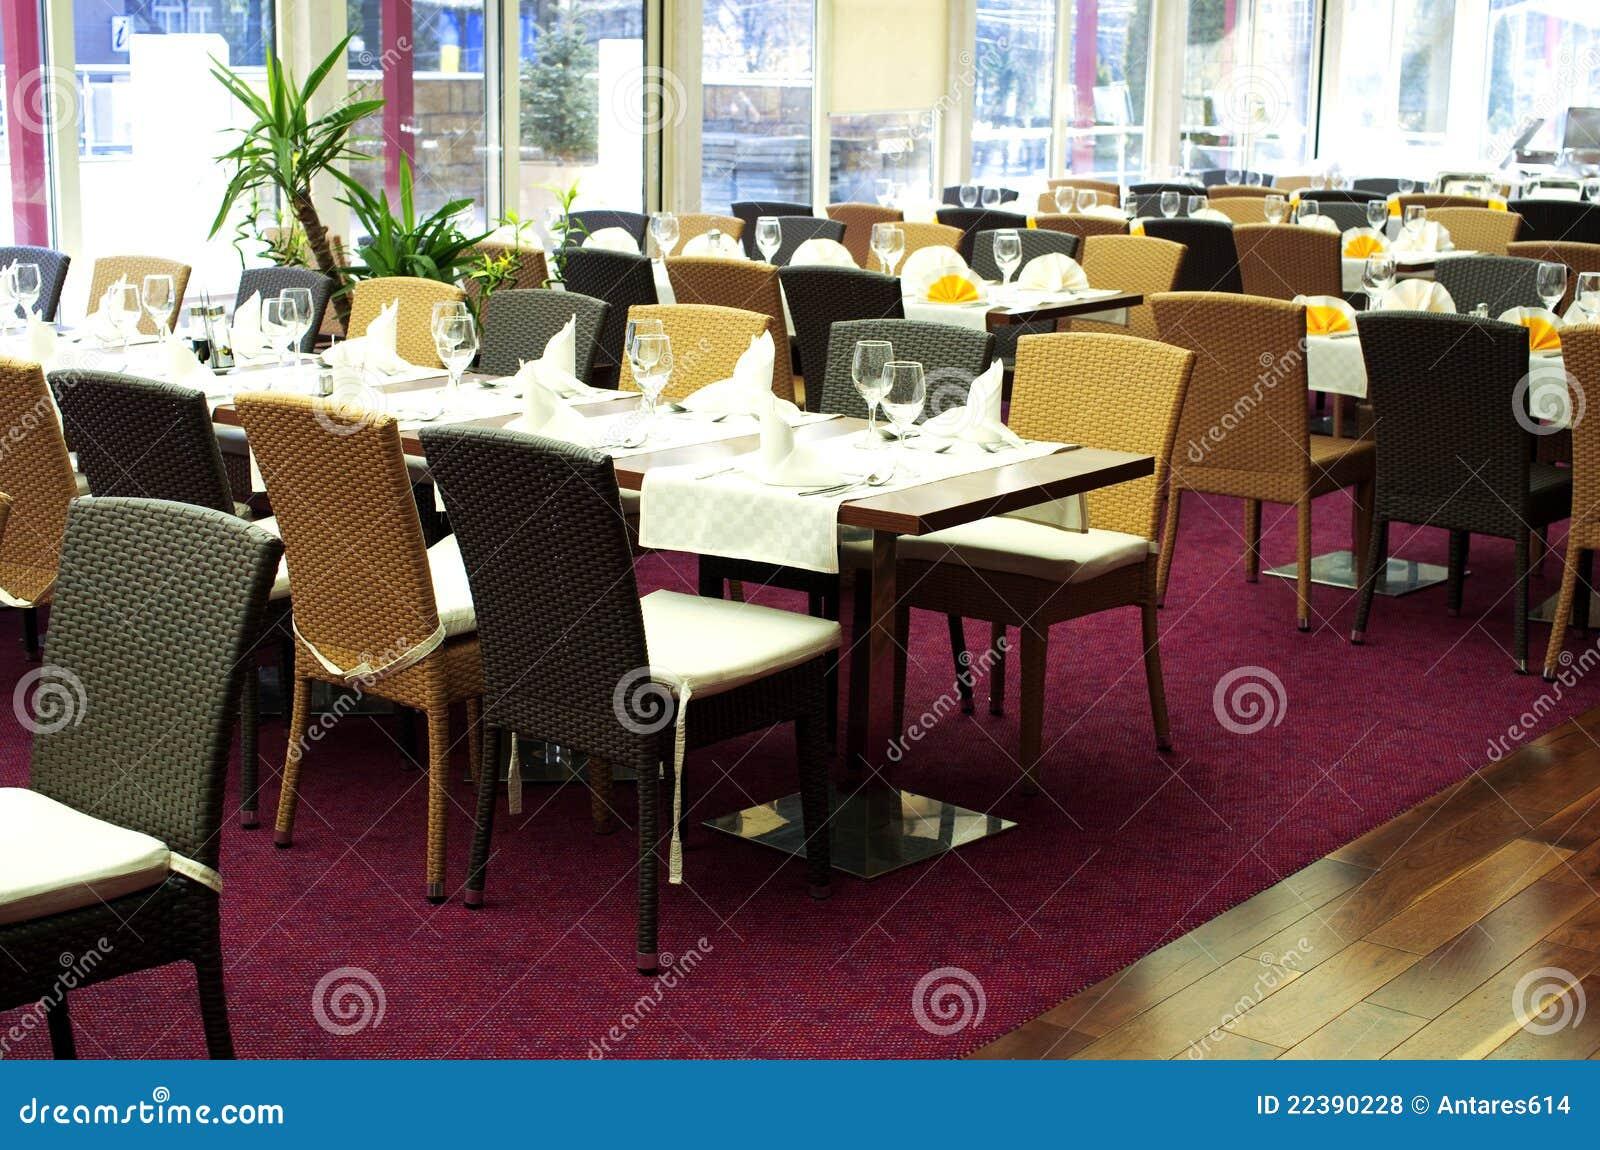 Restaurant tables - Restaurant Tables Royalty Free Stock Photos